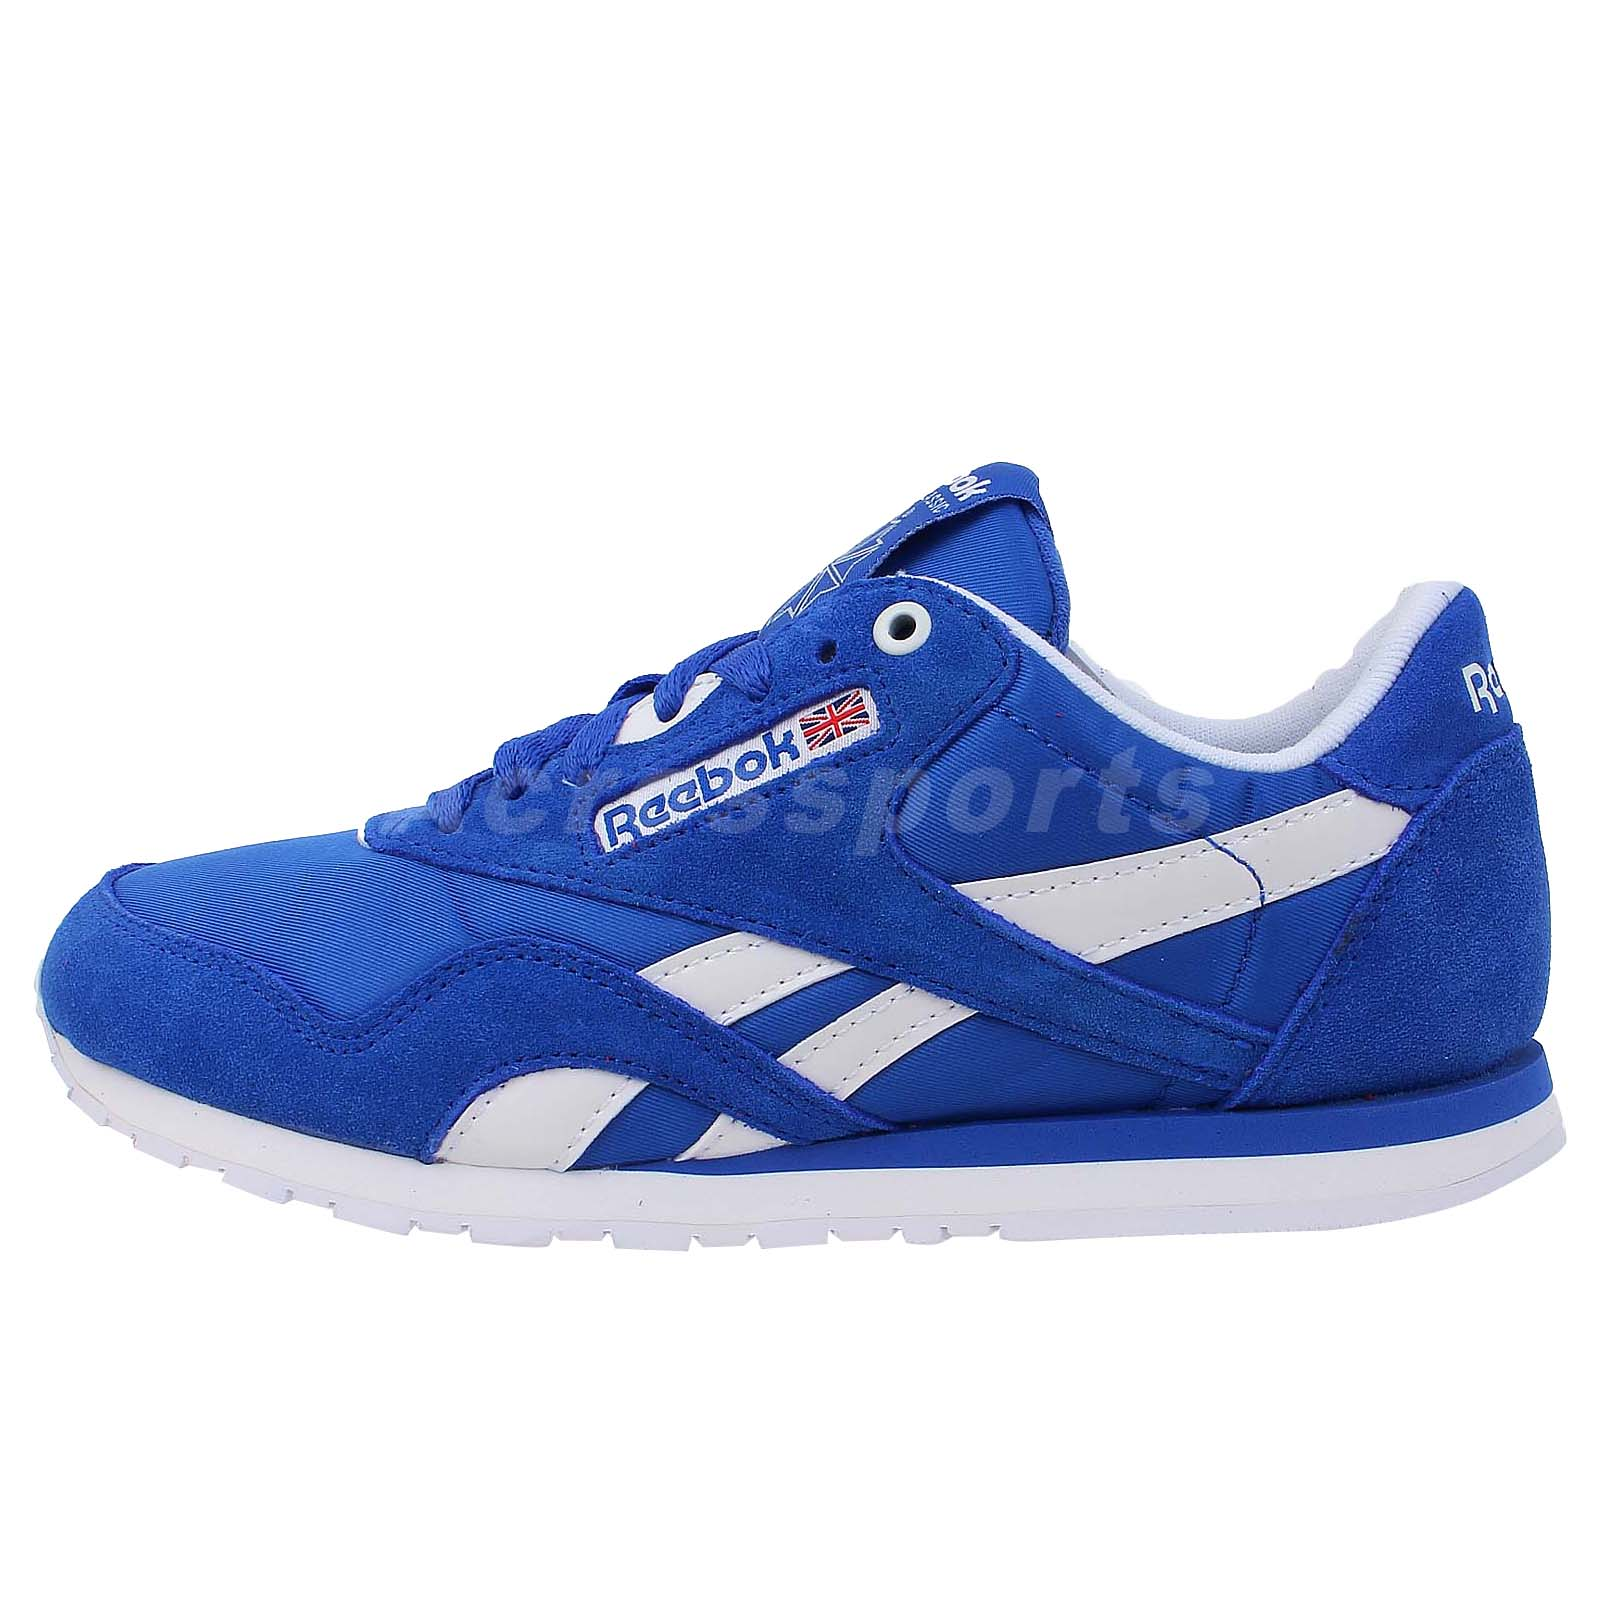 Reebok Running Shoes 2013 Reebok CL Nylon Slim B...